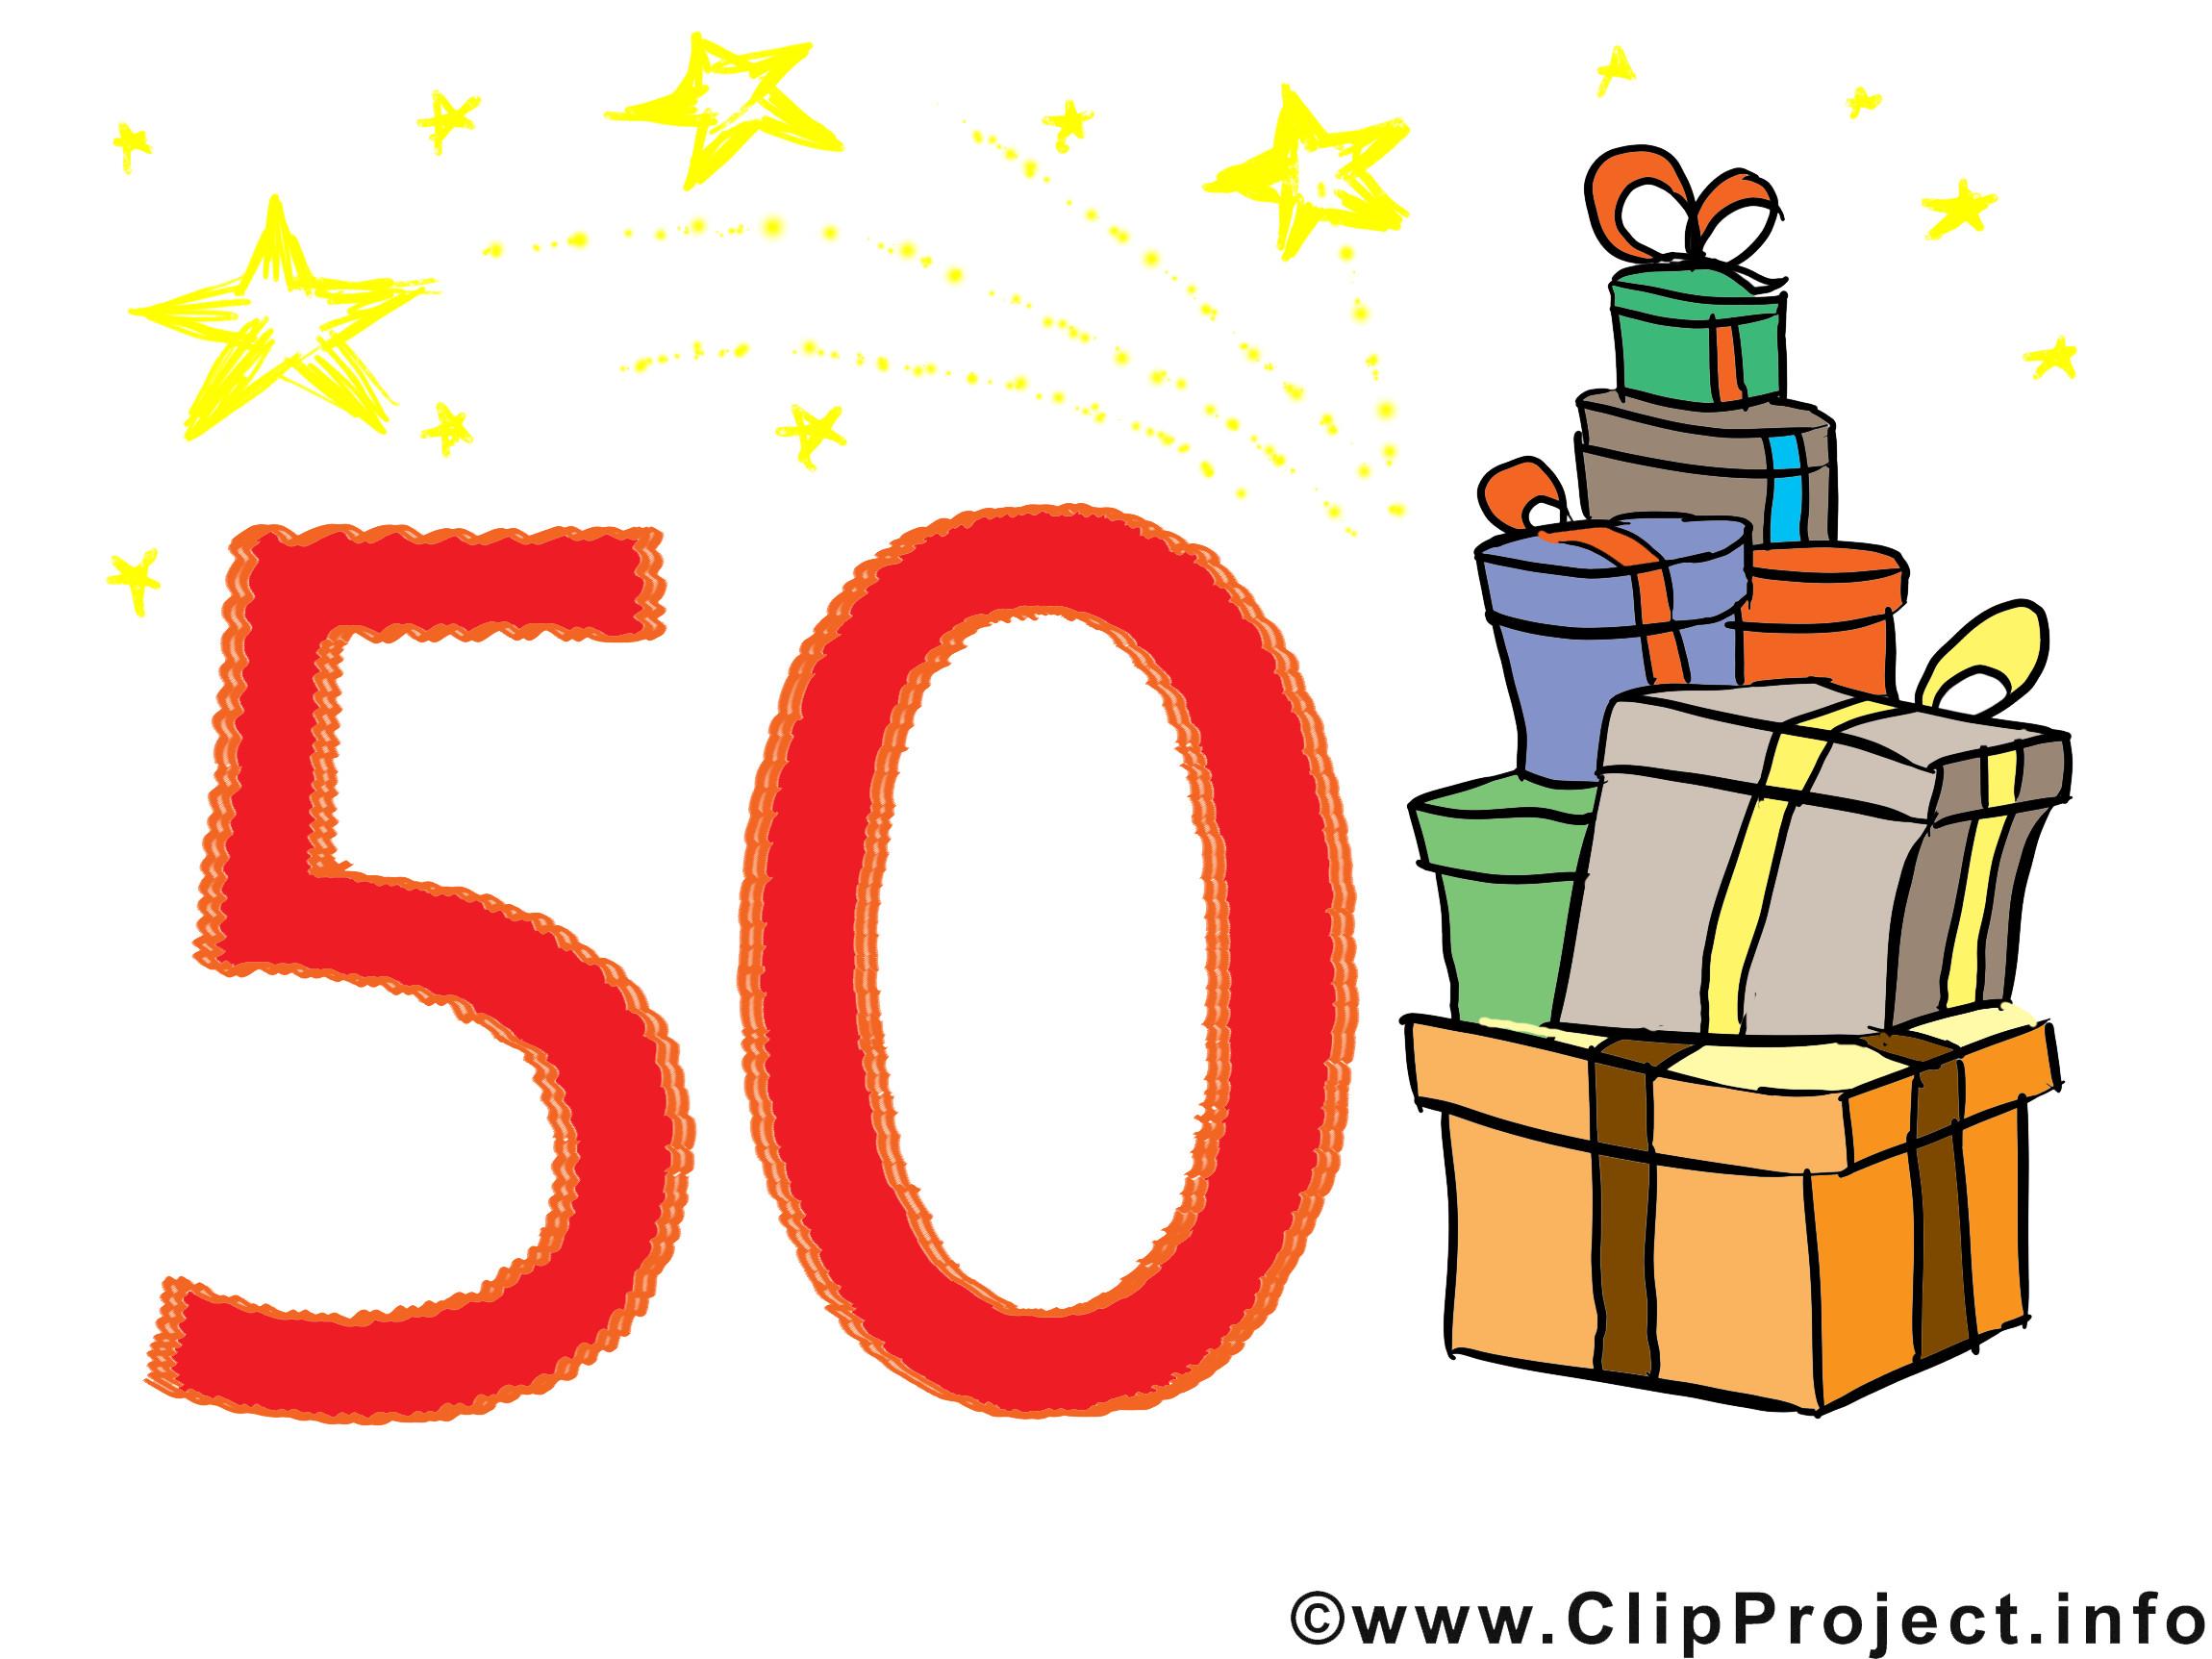 Geburtstagswünsche 50 Geburtstag  Geburtstagswünsche zum 50 Clipart Bild Glückwunschkarte